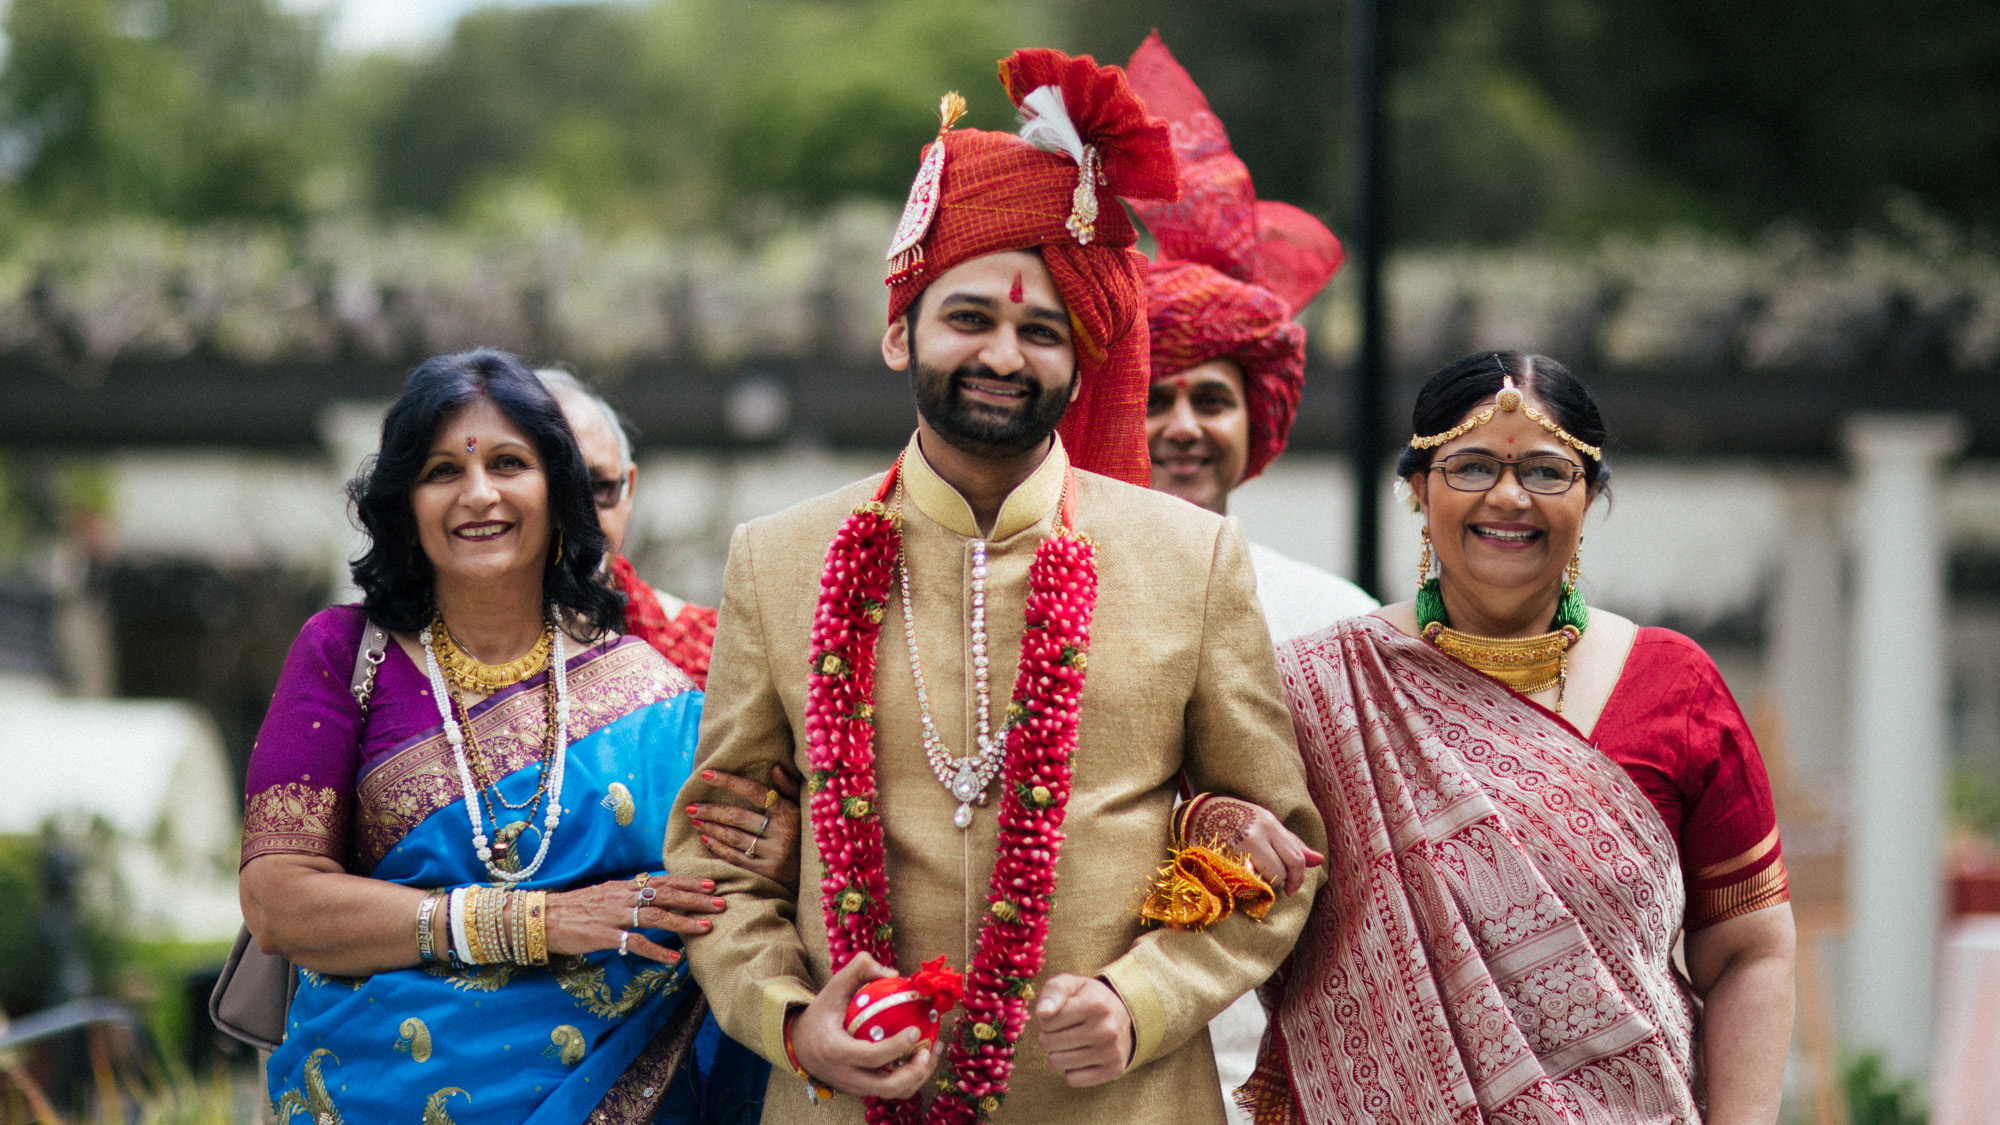 anu_maneesh_alec_vanderboom_Indian_wedding_photography-0089.jpg